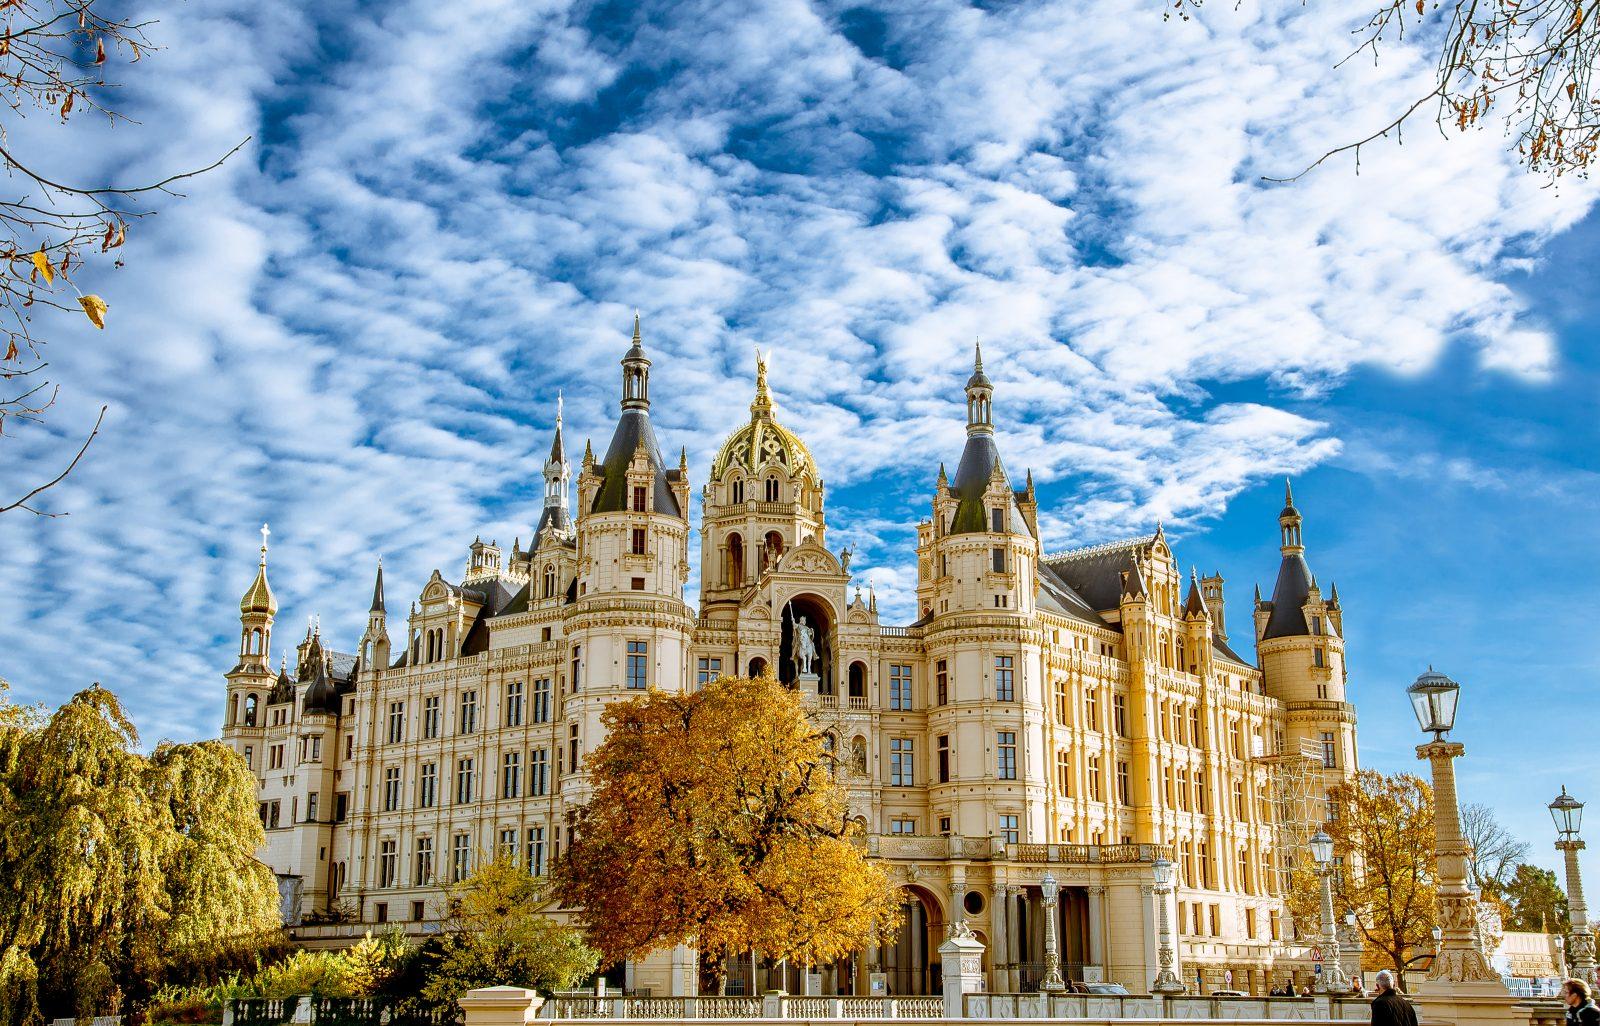 2017World   Germany Schwerin Castle under the beautiful blue sky in autumn  Germany 119942  - Поехать в Германию самостоятельно